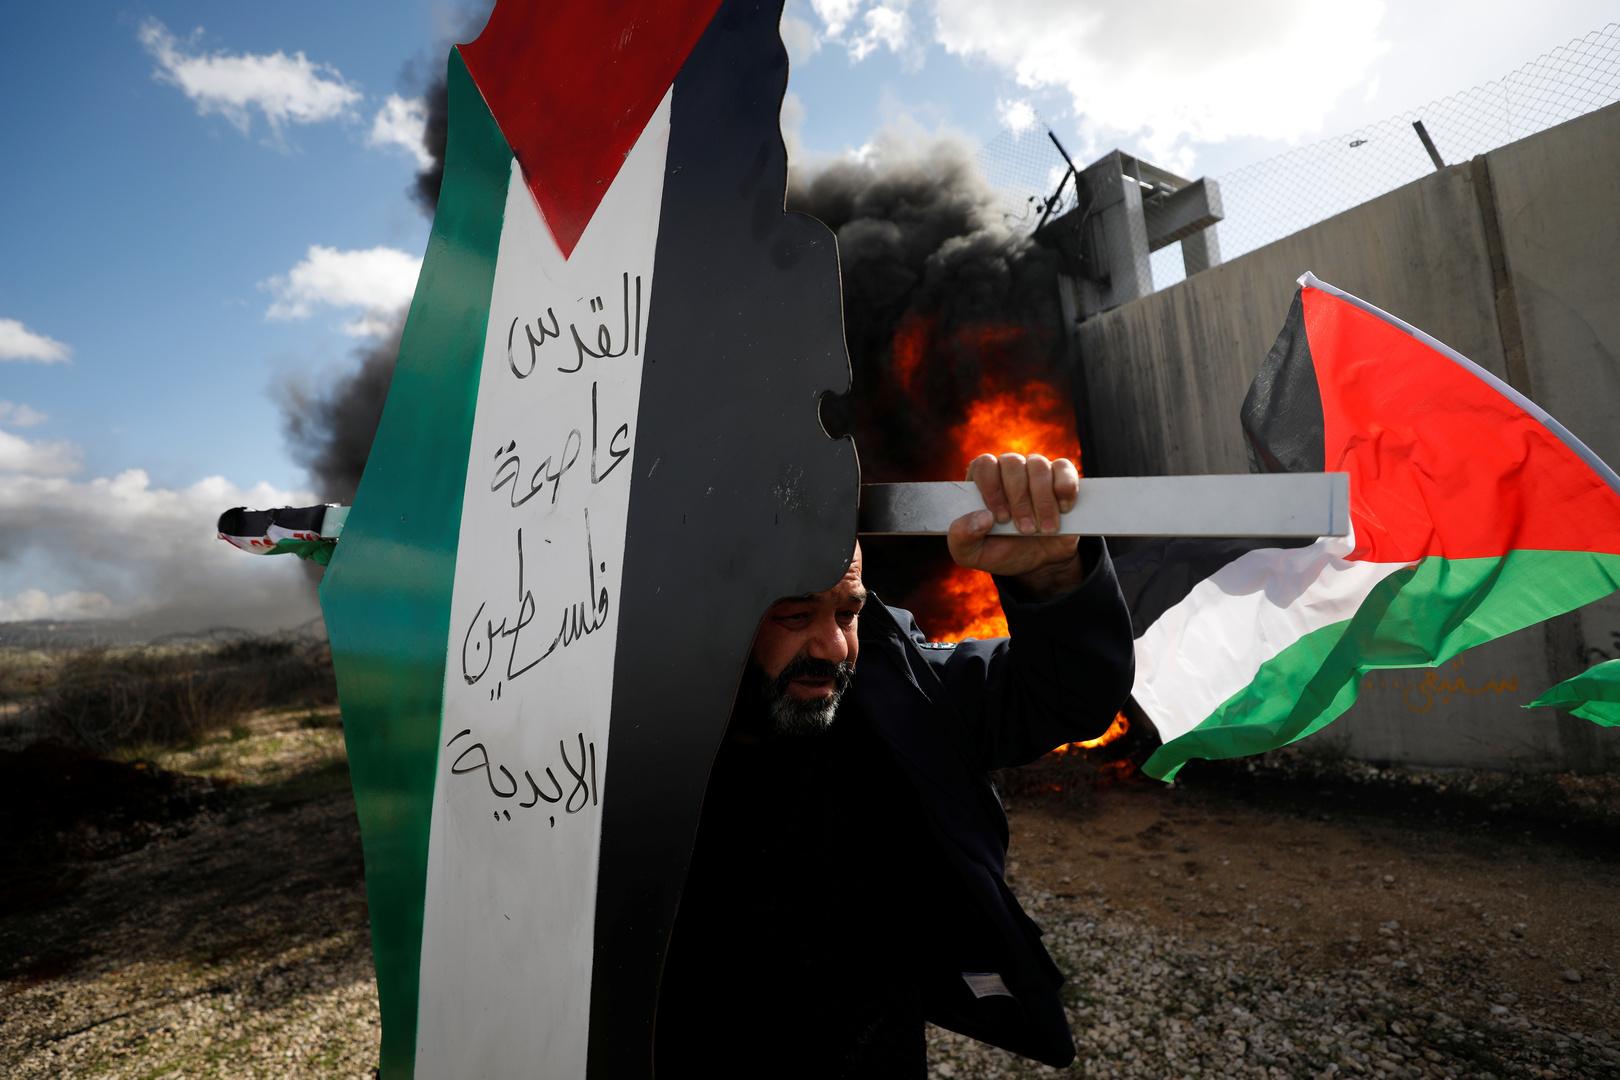 United Nations: Israel must immediately stop demolishing Palestinian homes